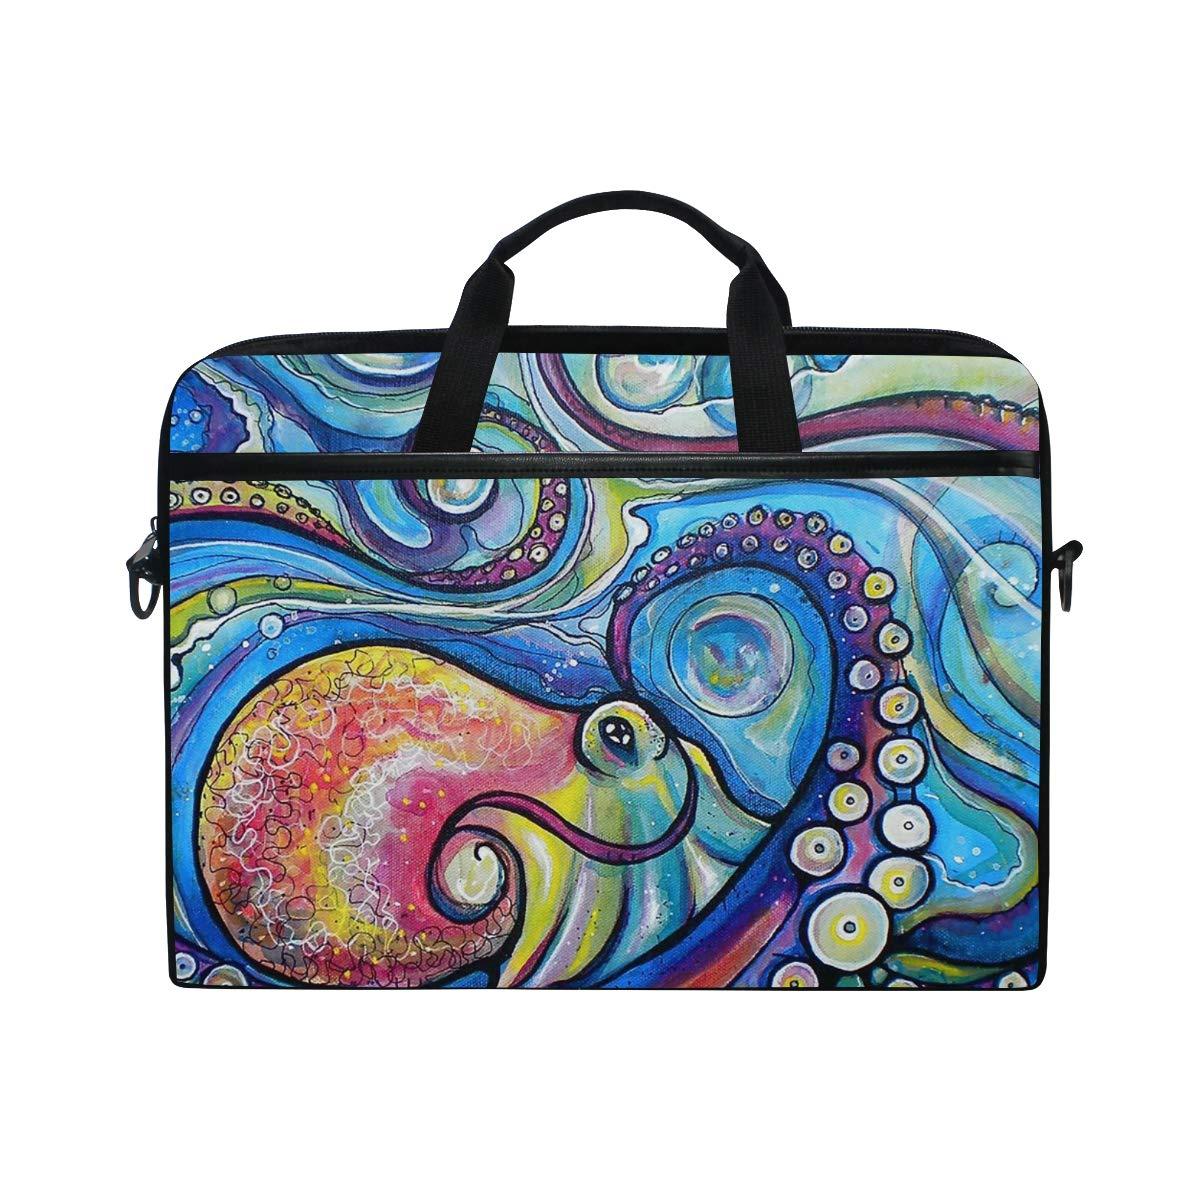 37b393f7b87a Amazon.com: Octopus Painting Laptop Shoulder Messenger Bag Sleeve ...